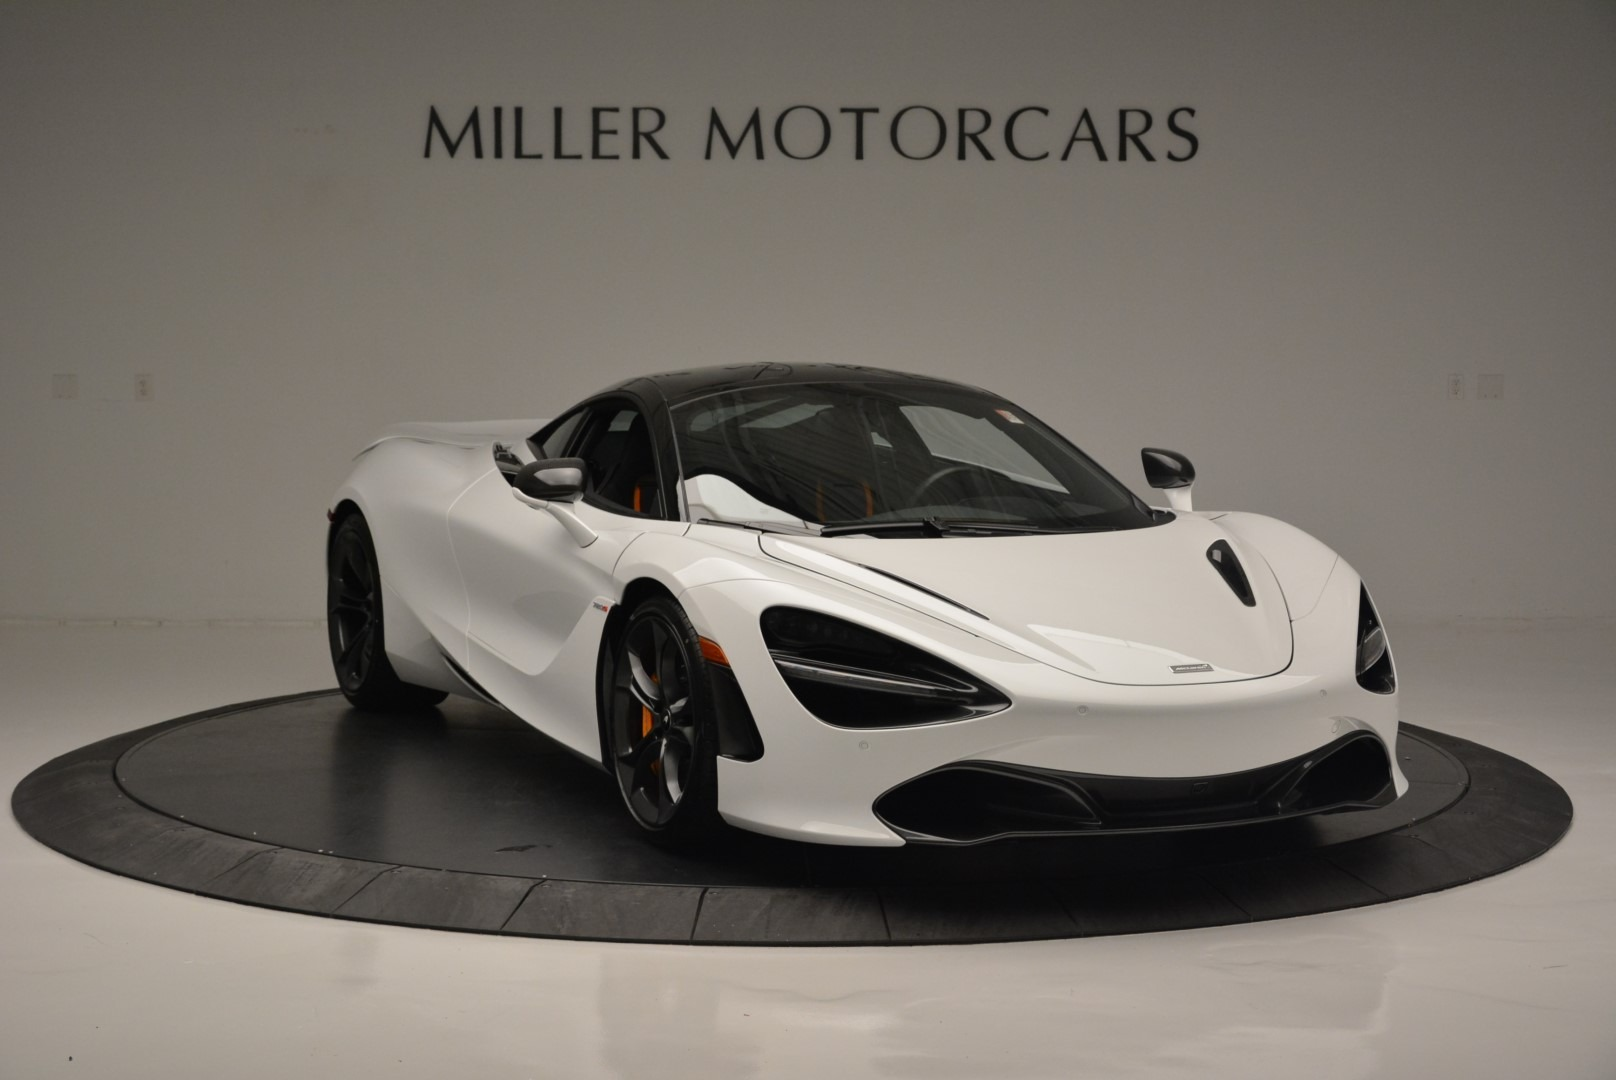 Used 2019 McLaren 720S Coupe For Sale In Westport, CT 2543_p11